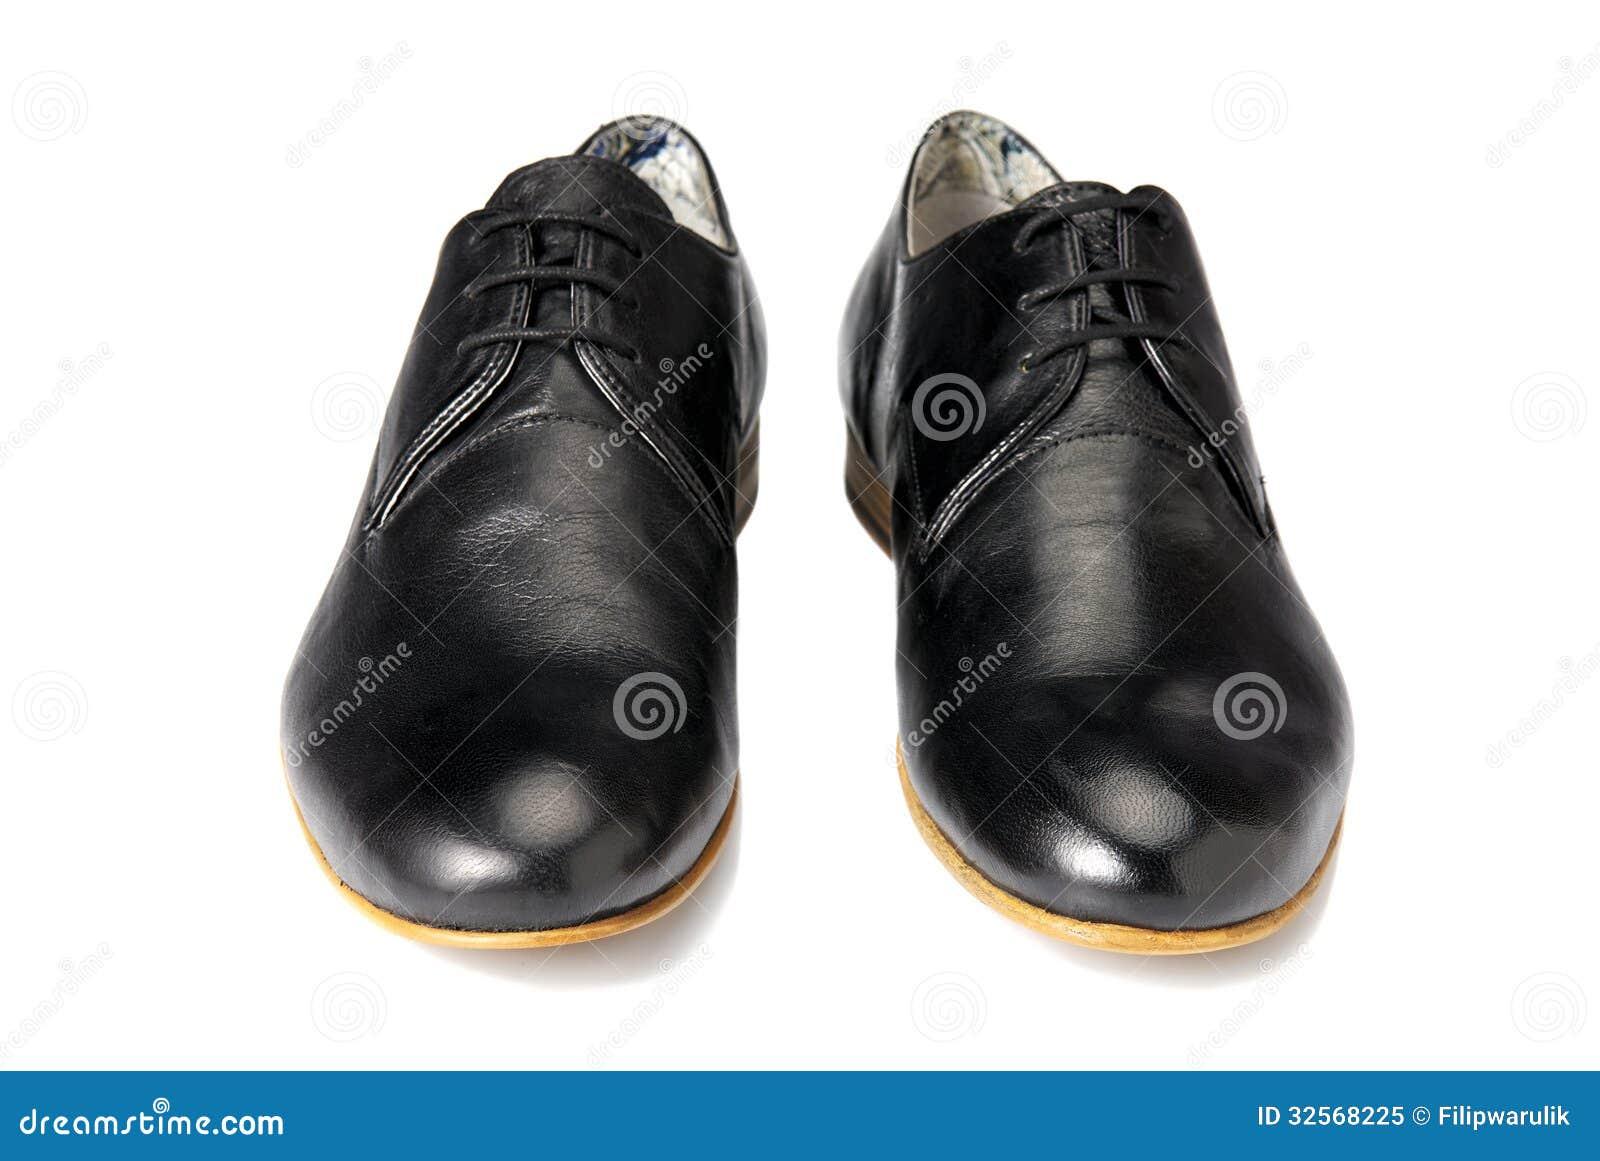 Mens Zebra Shoes Images Modern Home Design And